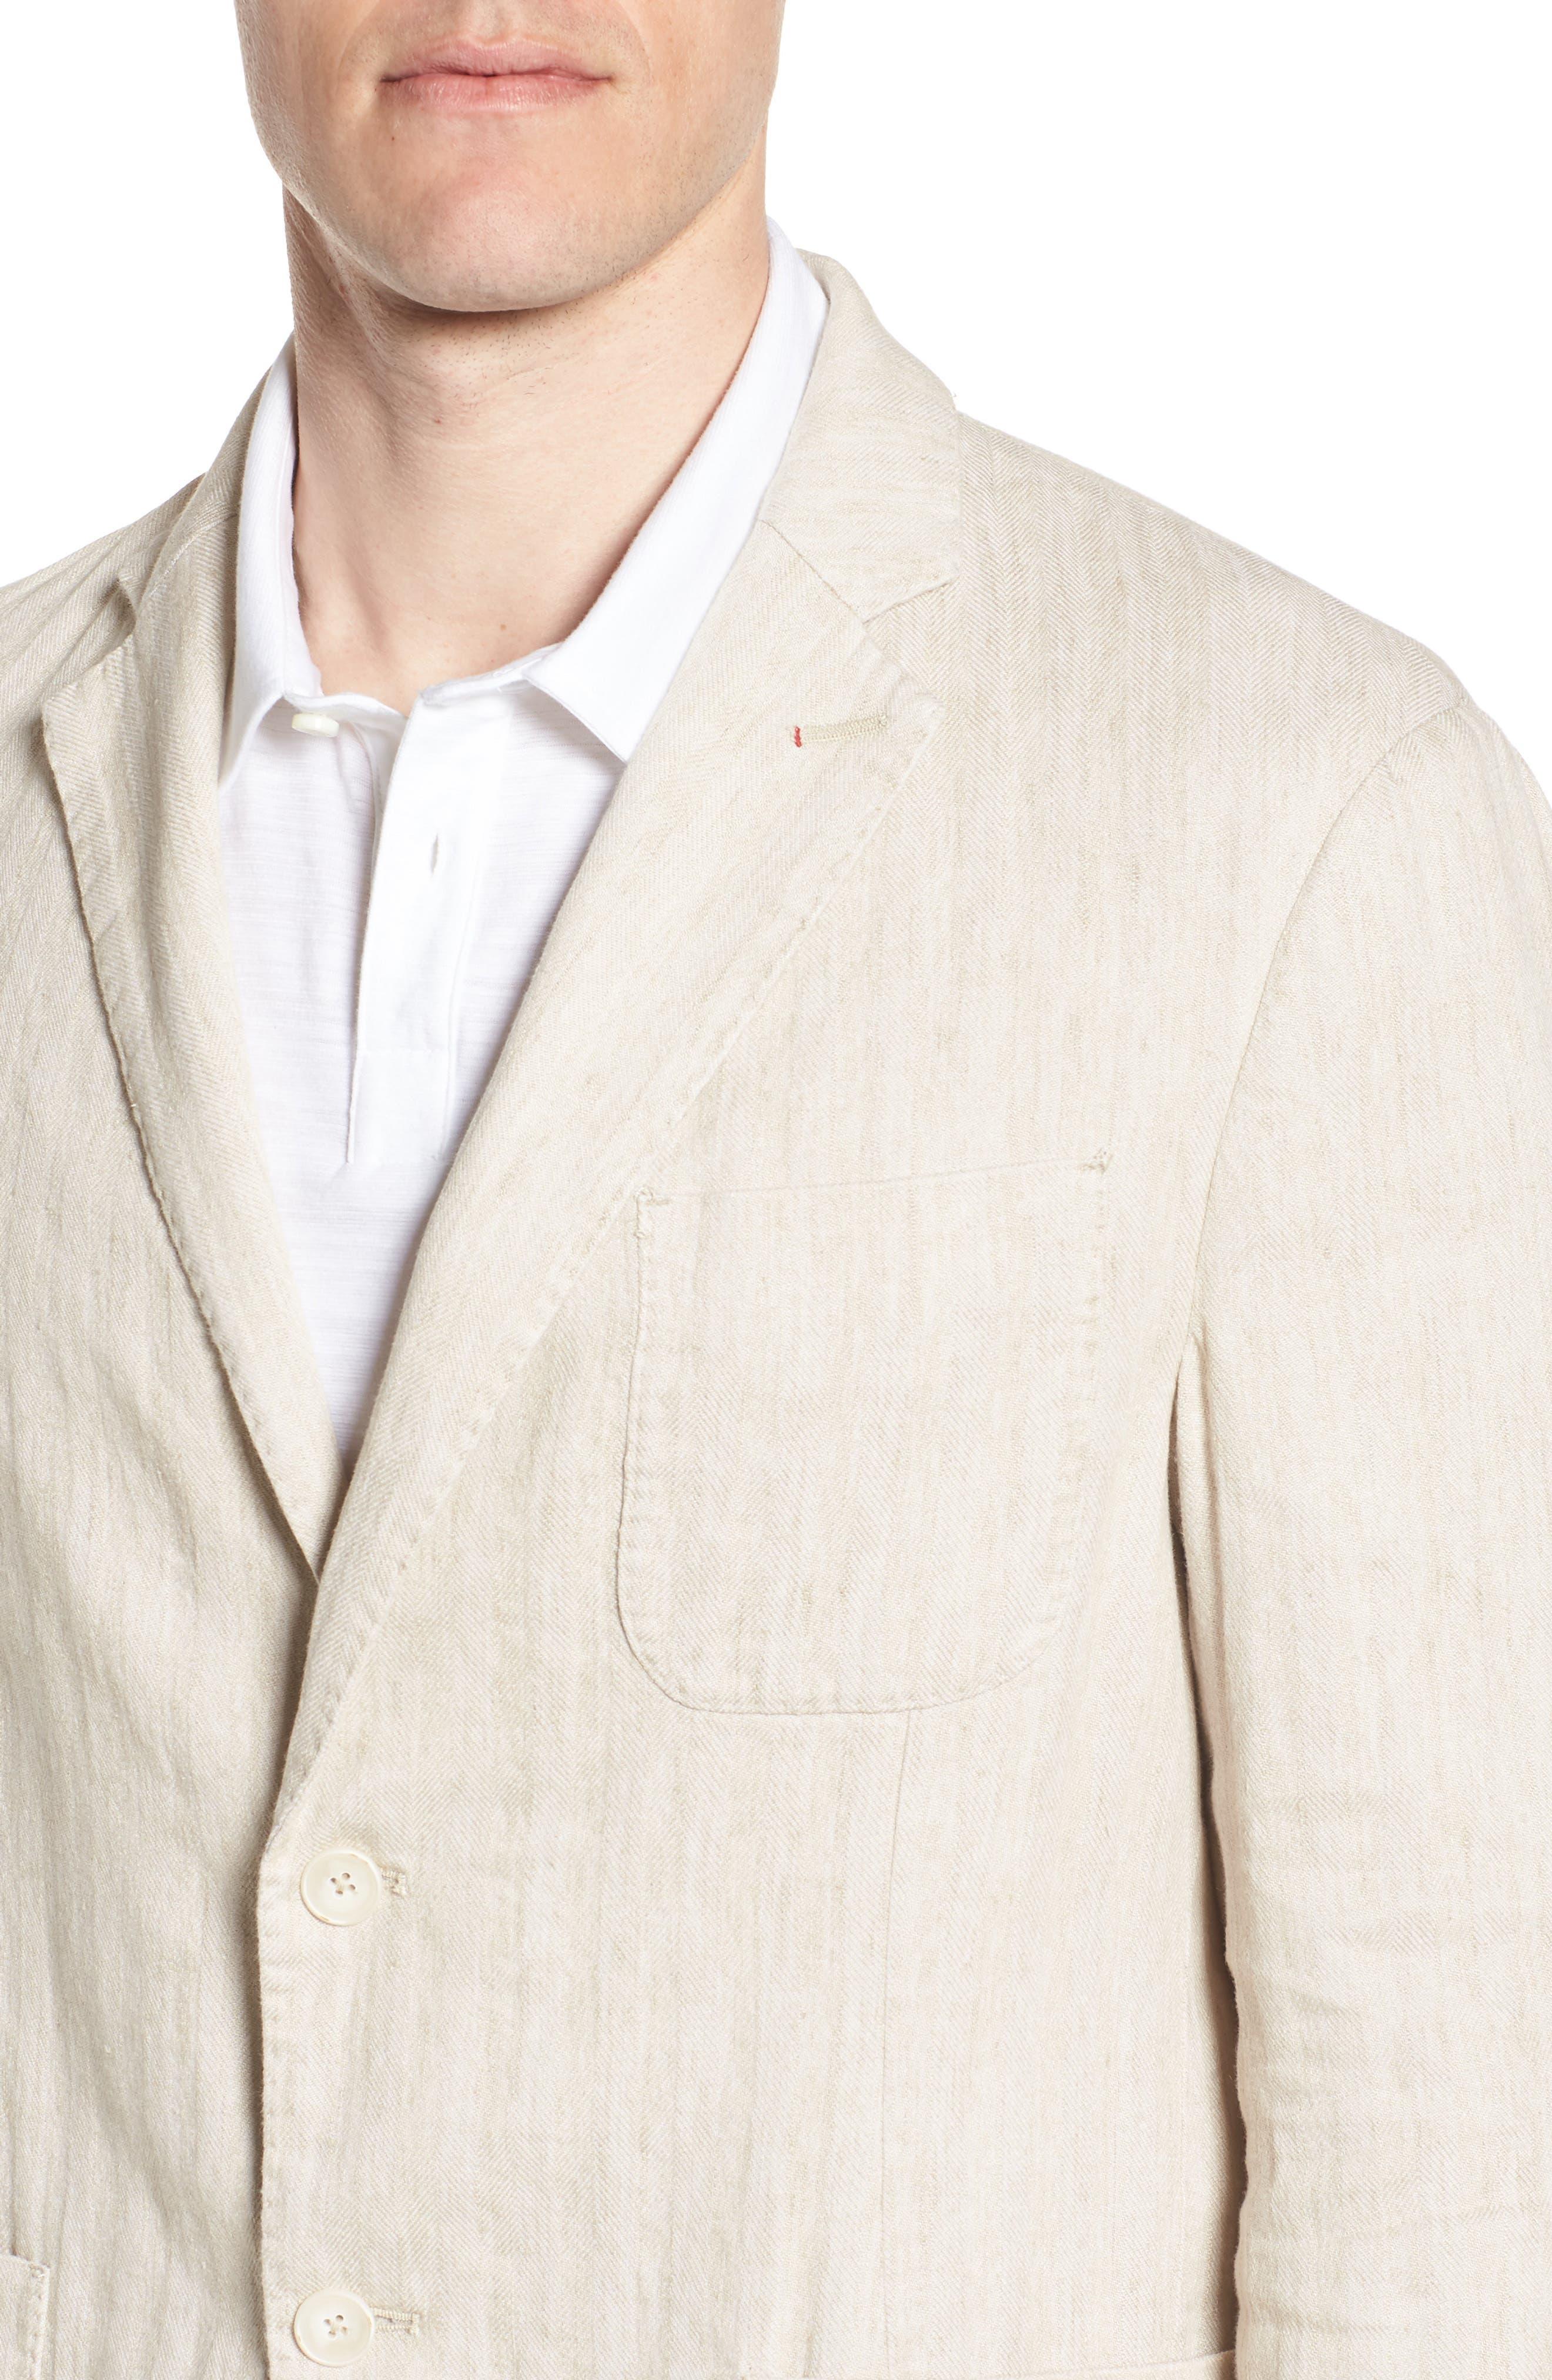 Regular Fit Herringbone Cotton & Linen Blazer,                             Alternate thumbnail 4, color,                             200